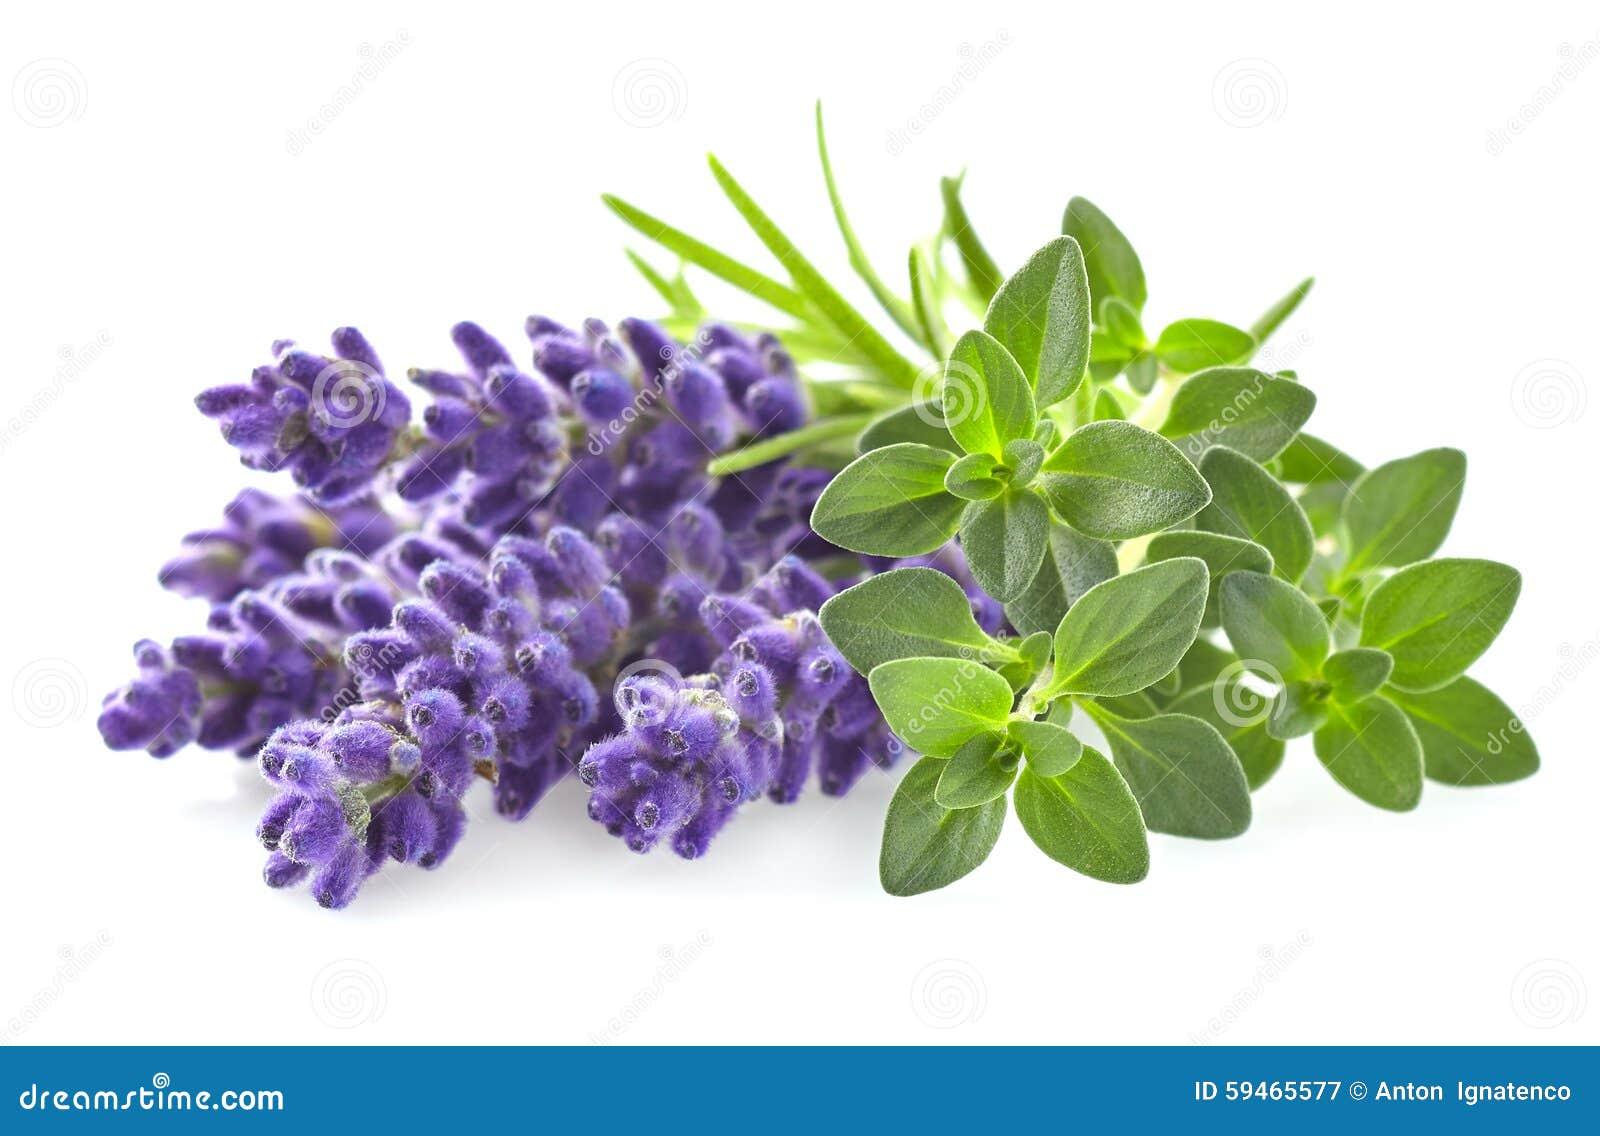 thymian mit lavendel stockfoto bild 59465577. Black Bedroom Furniture Sets. Home Design Ideas